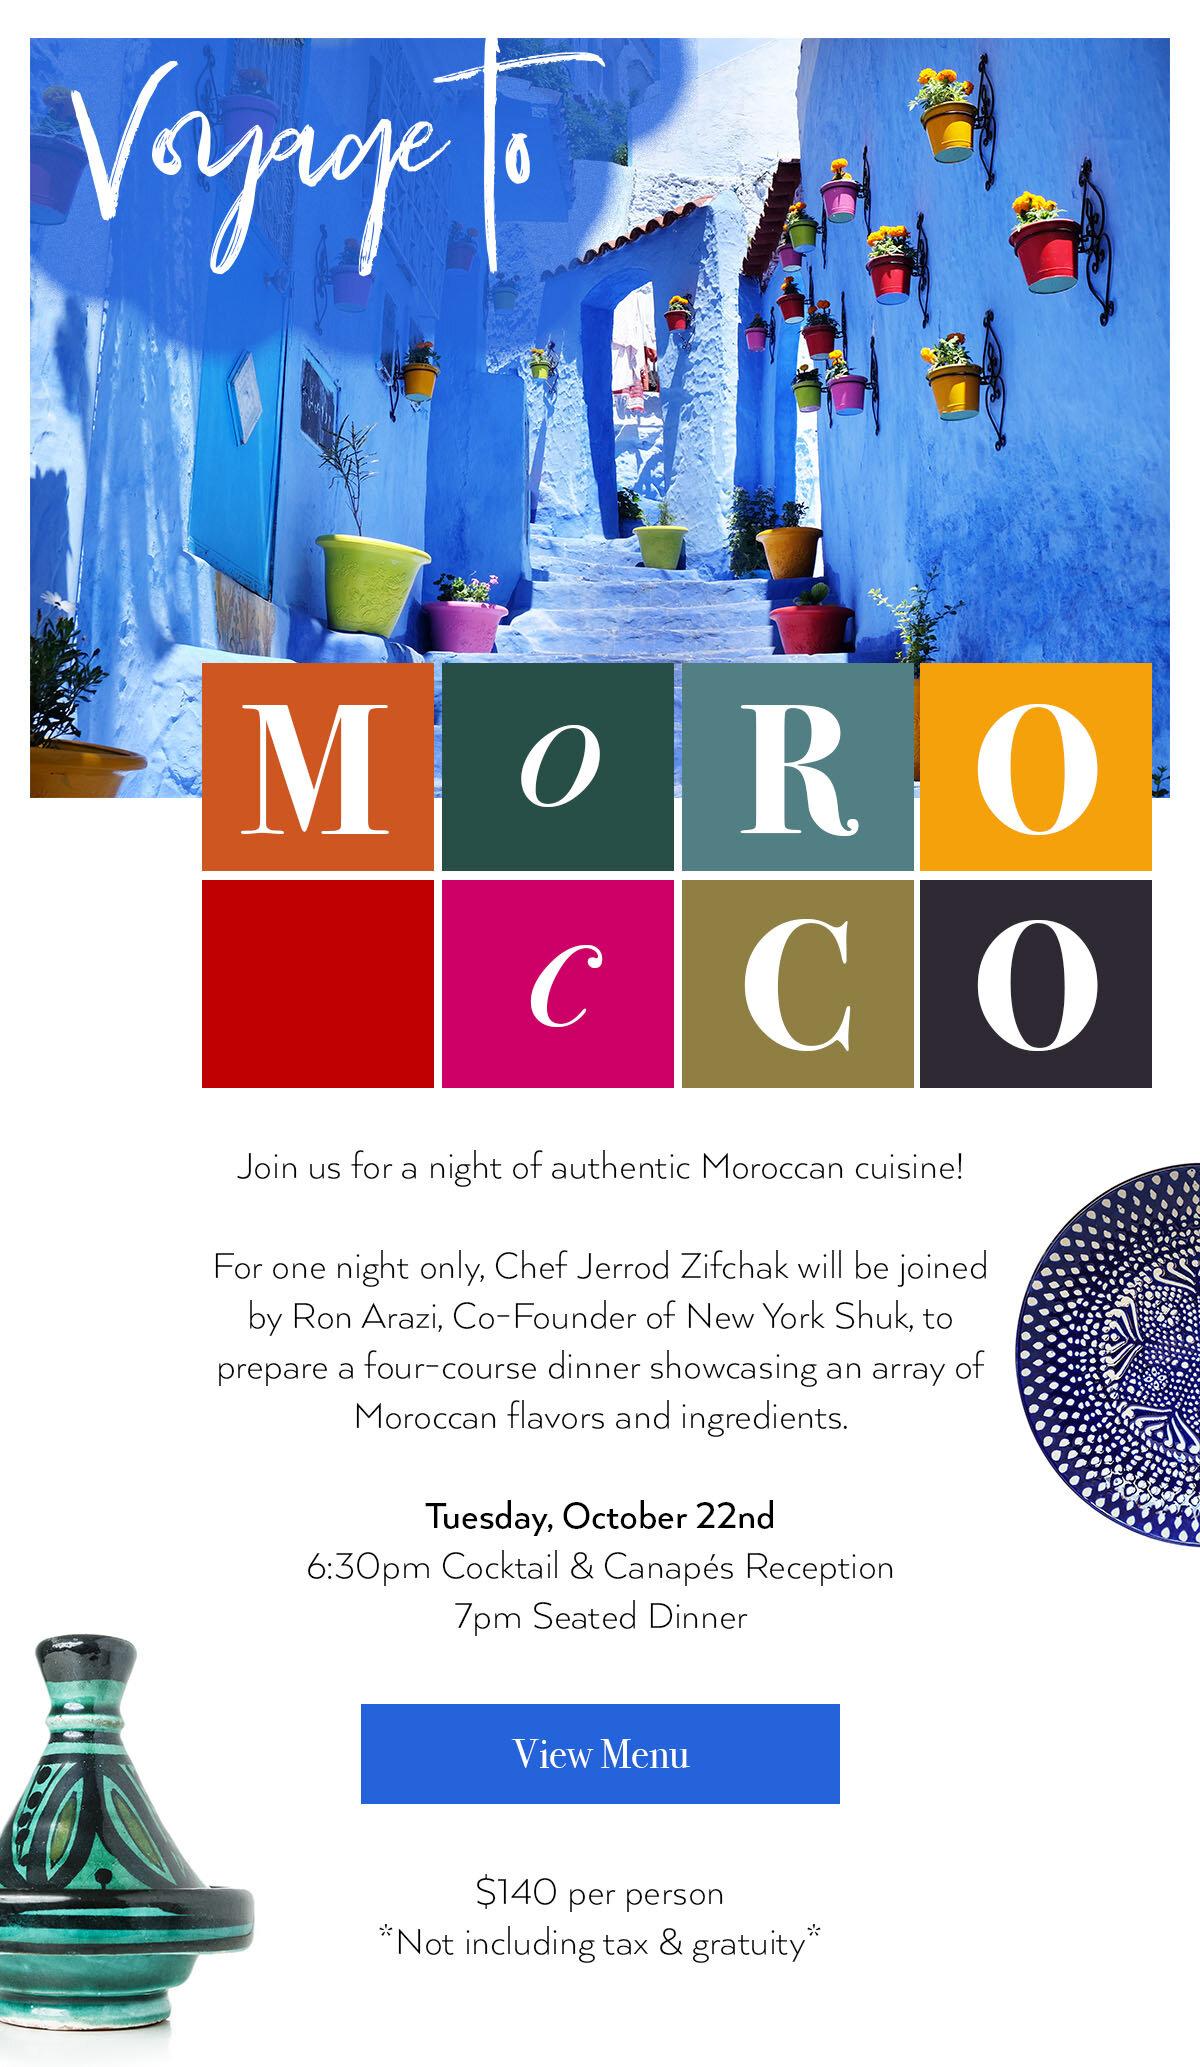 EB_Morocco Edit 2.jpg